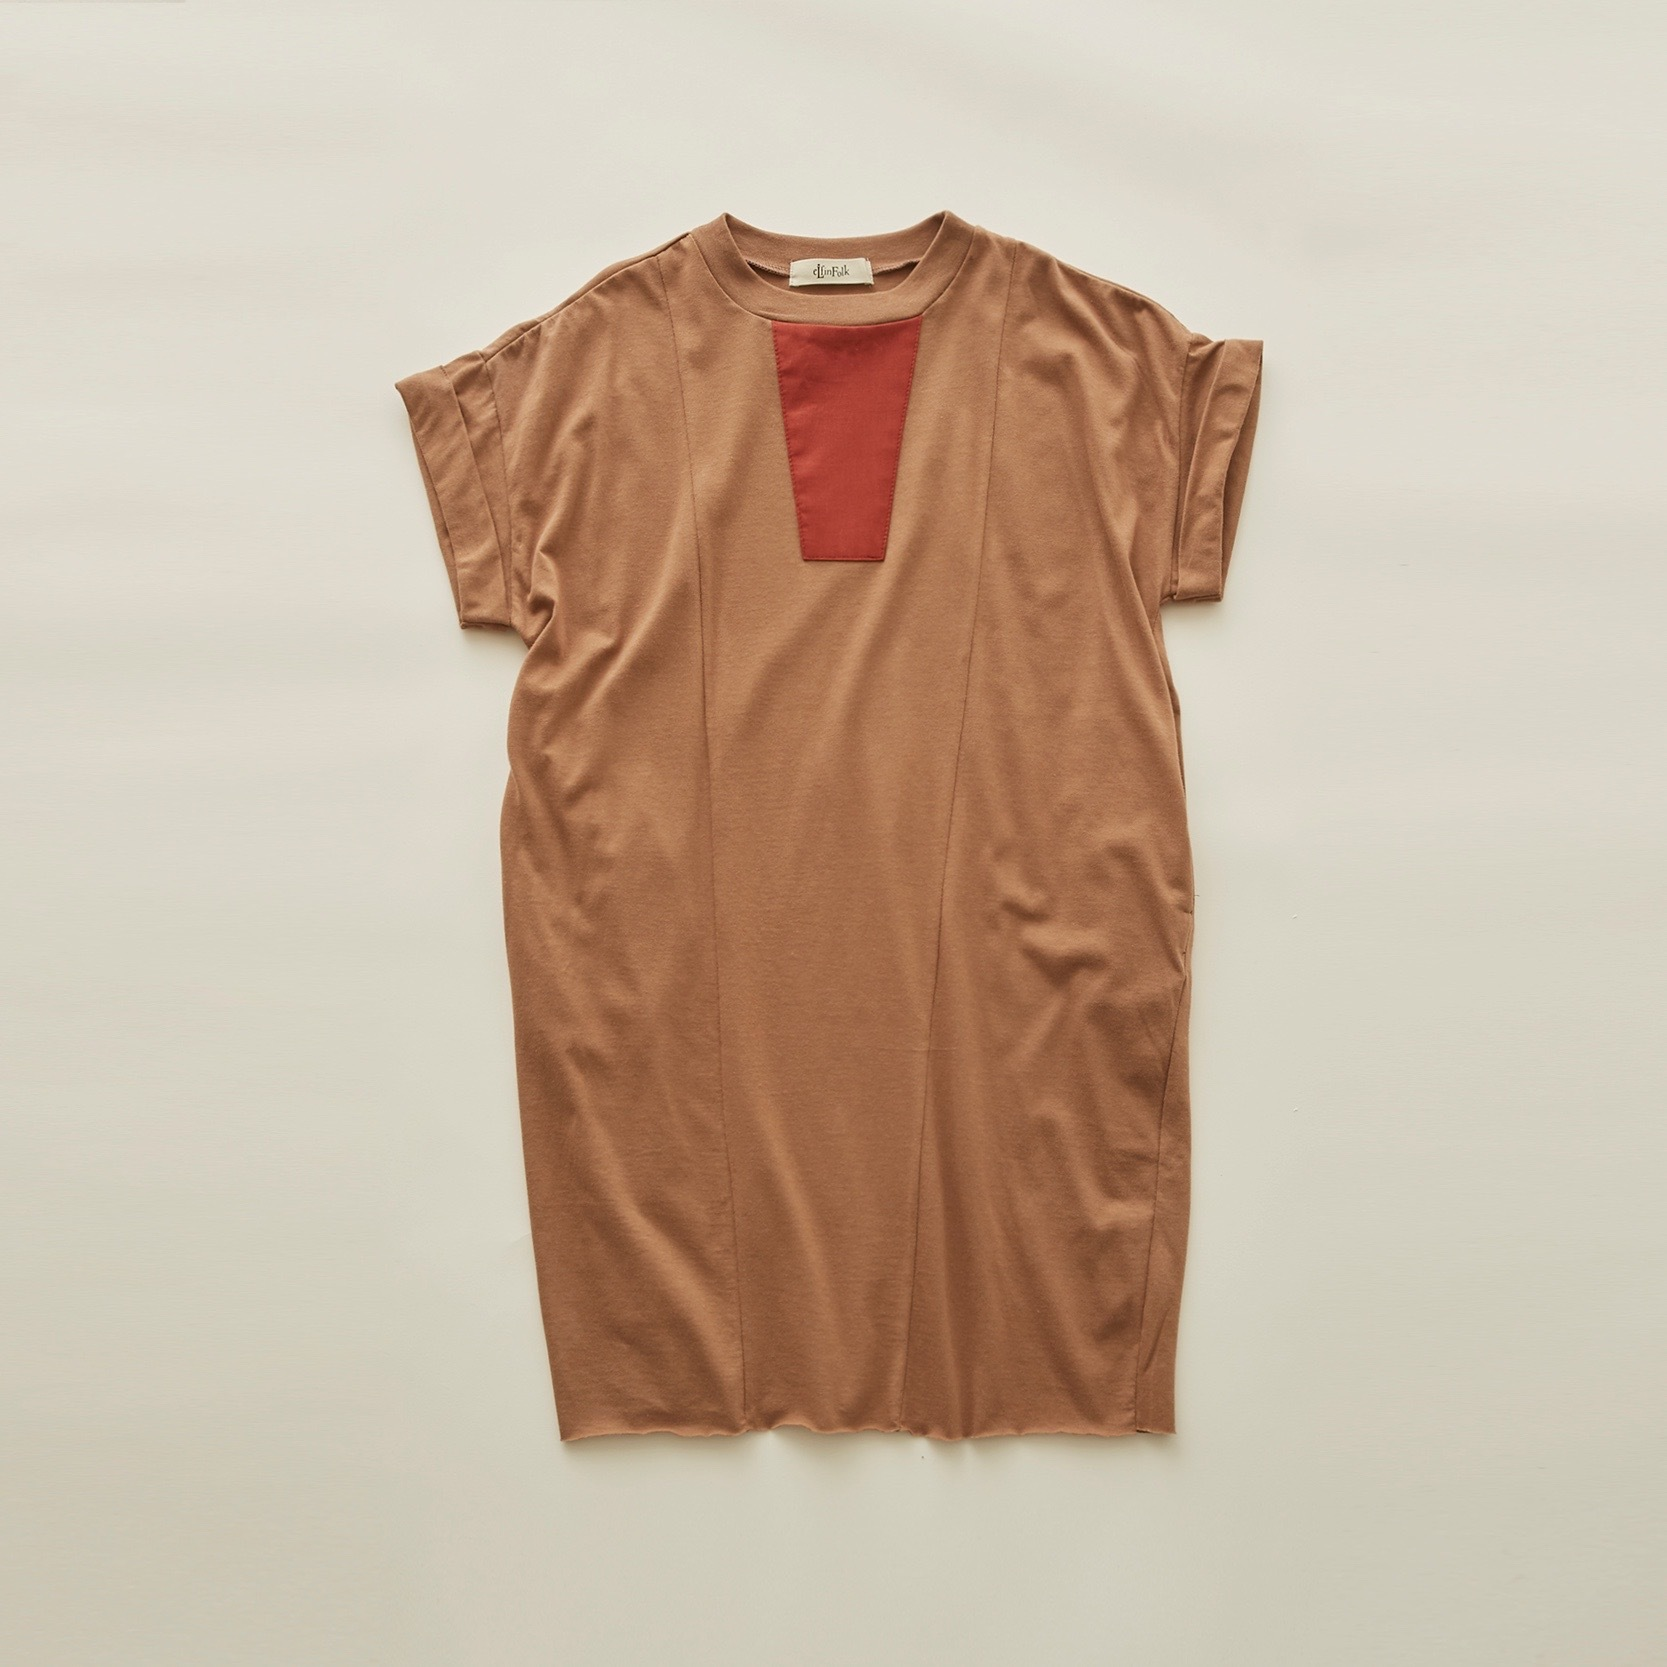 《eLfinFolk 2020SS》Maghreb maxi T / cocoa / 90・100cm